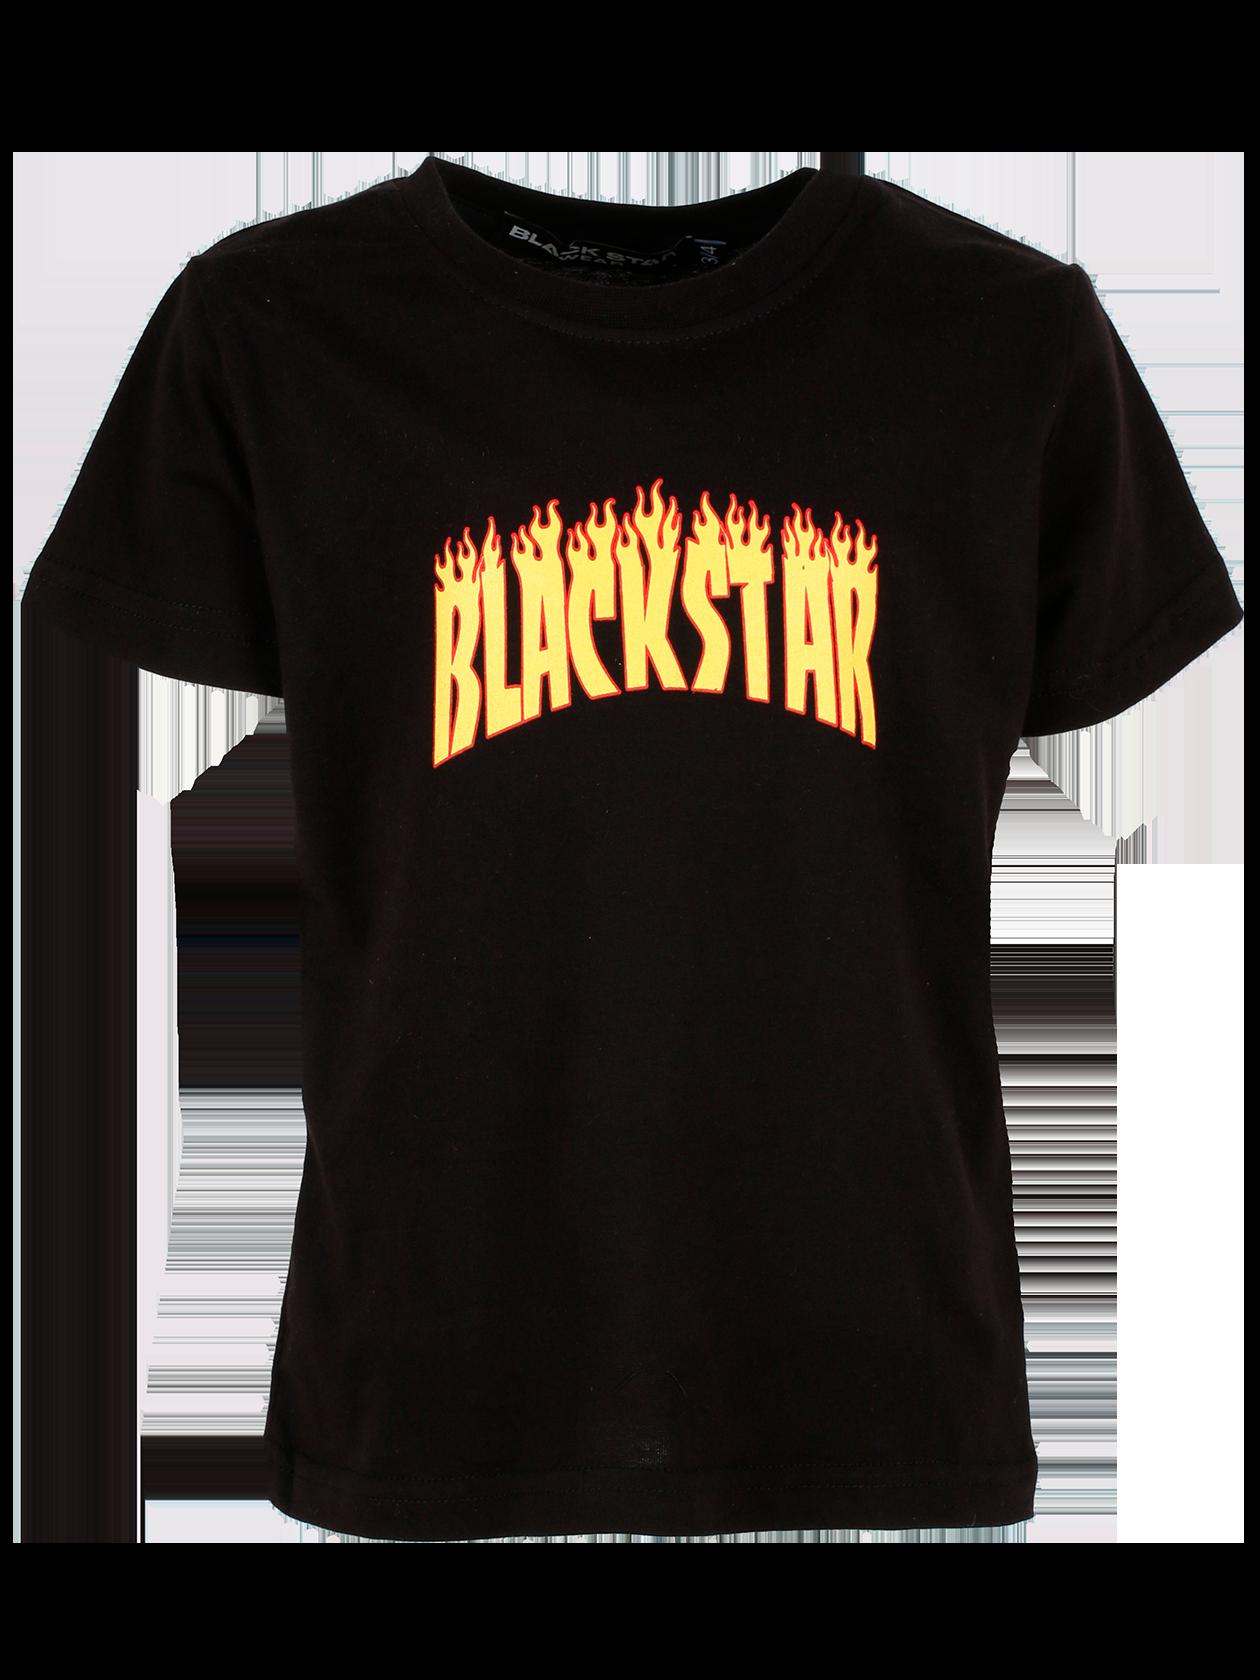 Футболка подростковая FIRETEENS от Black Star